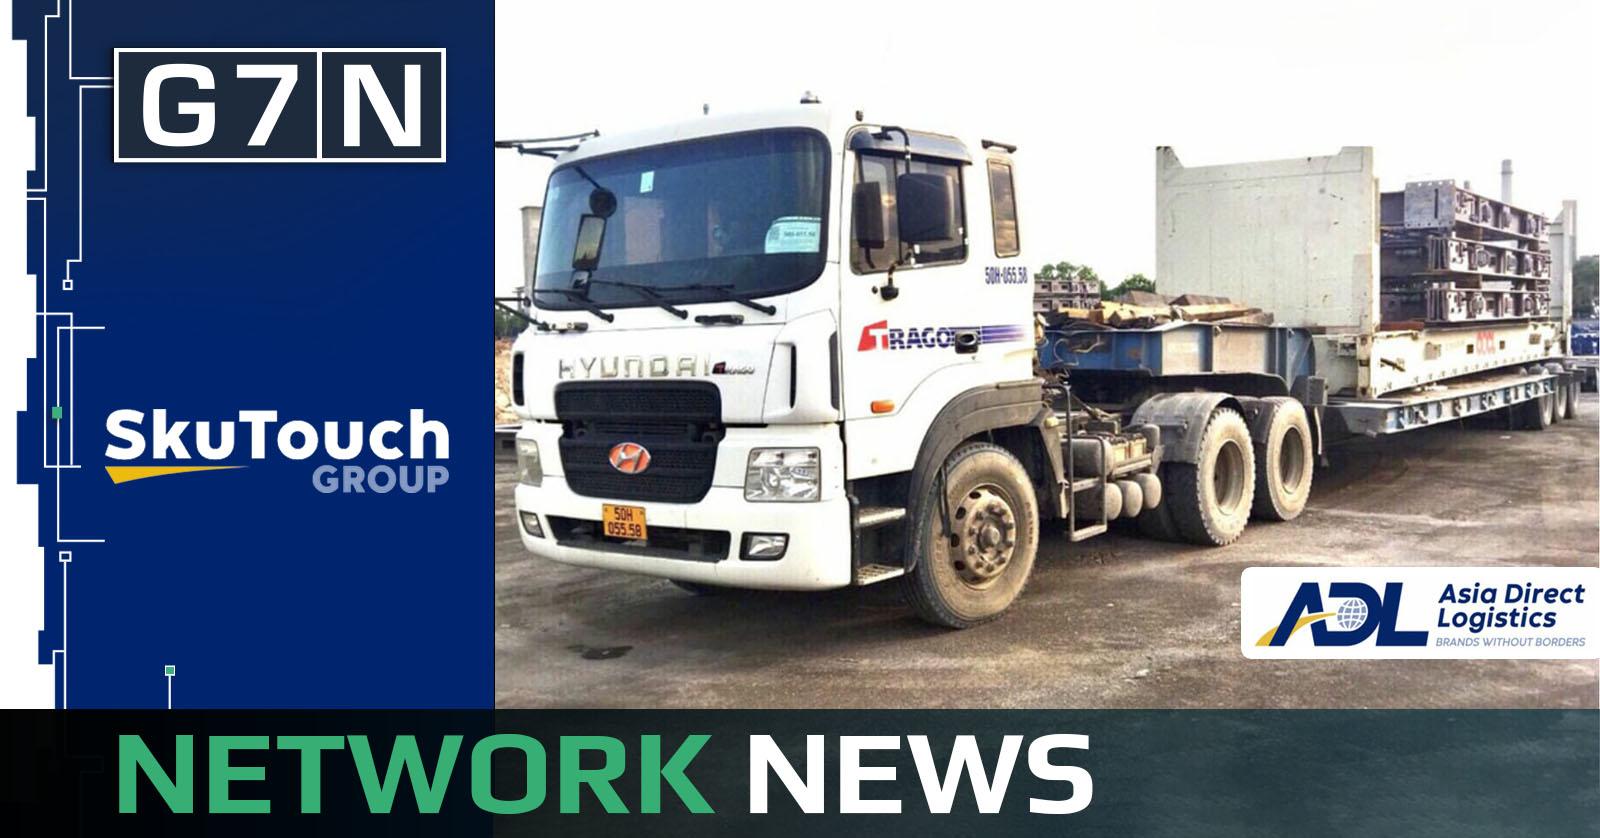 https://newg7dashboard.g7networks.com/news/news__260821_G7N_sku_NEWS.jpg